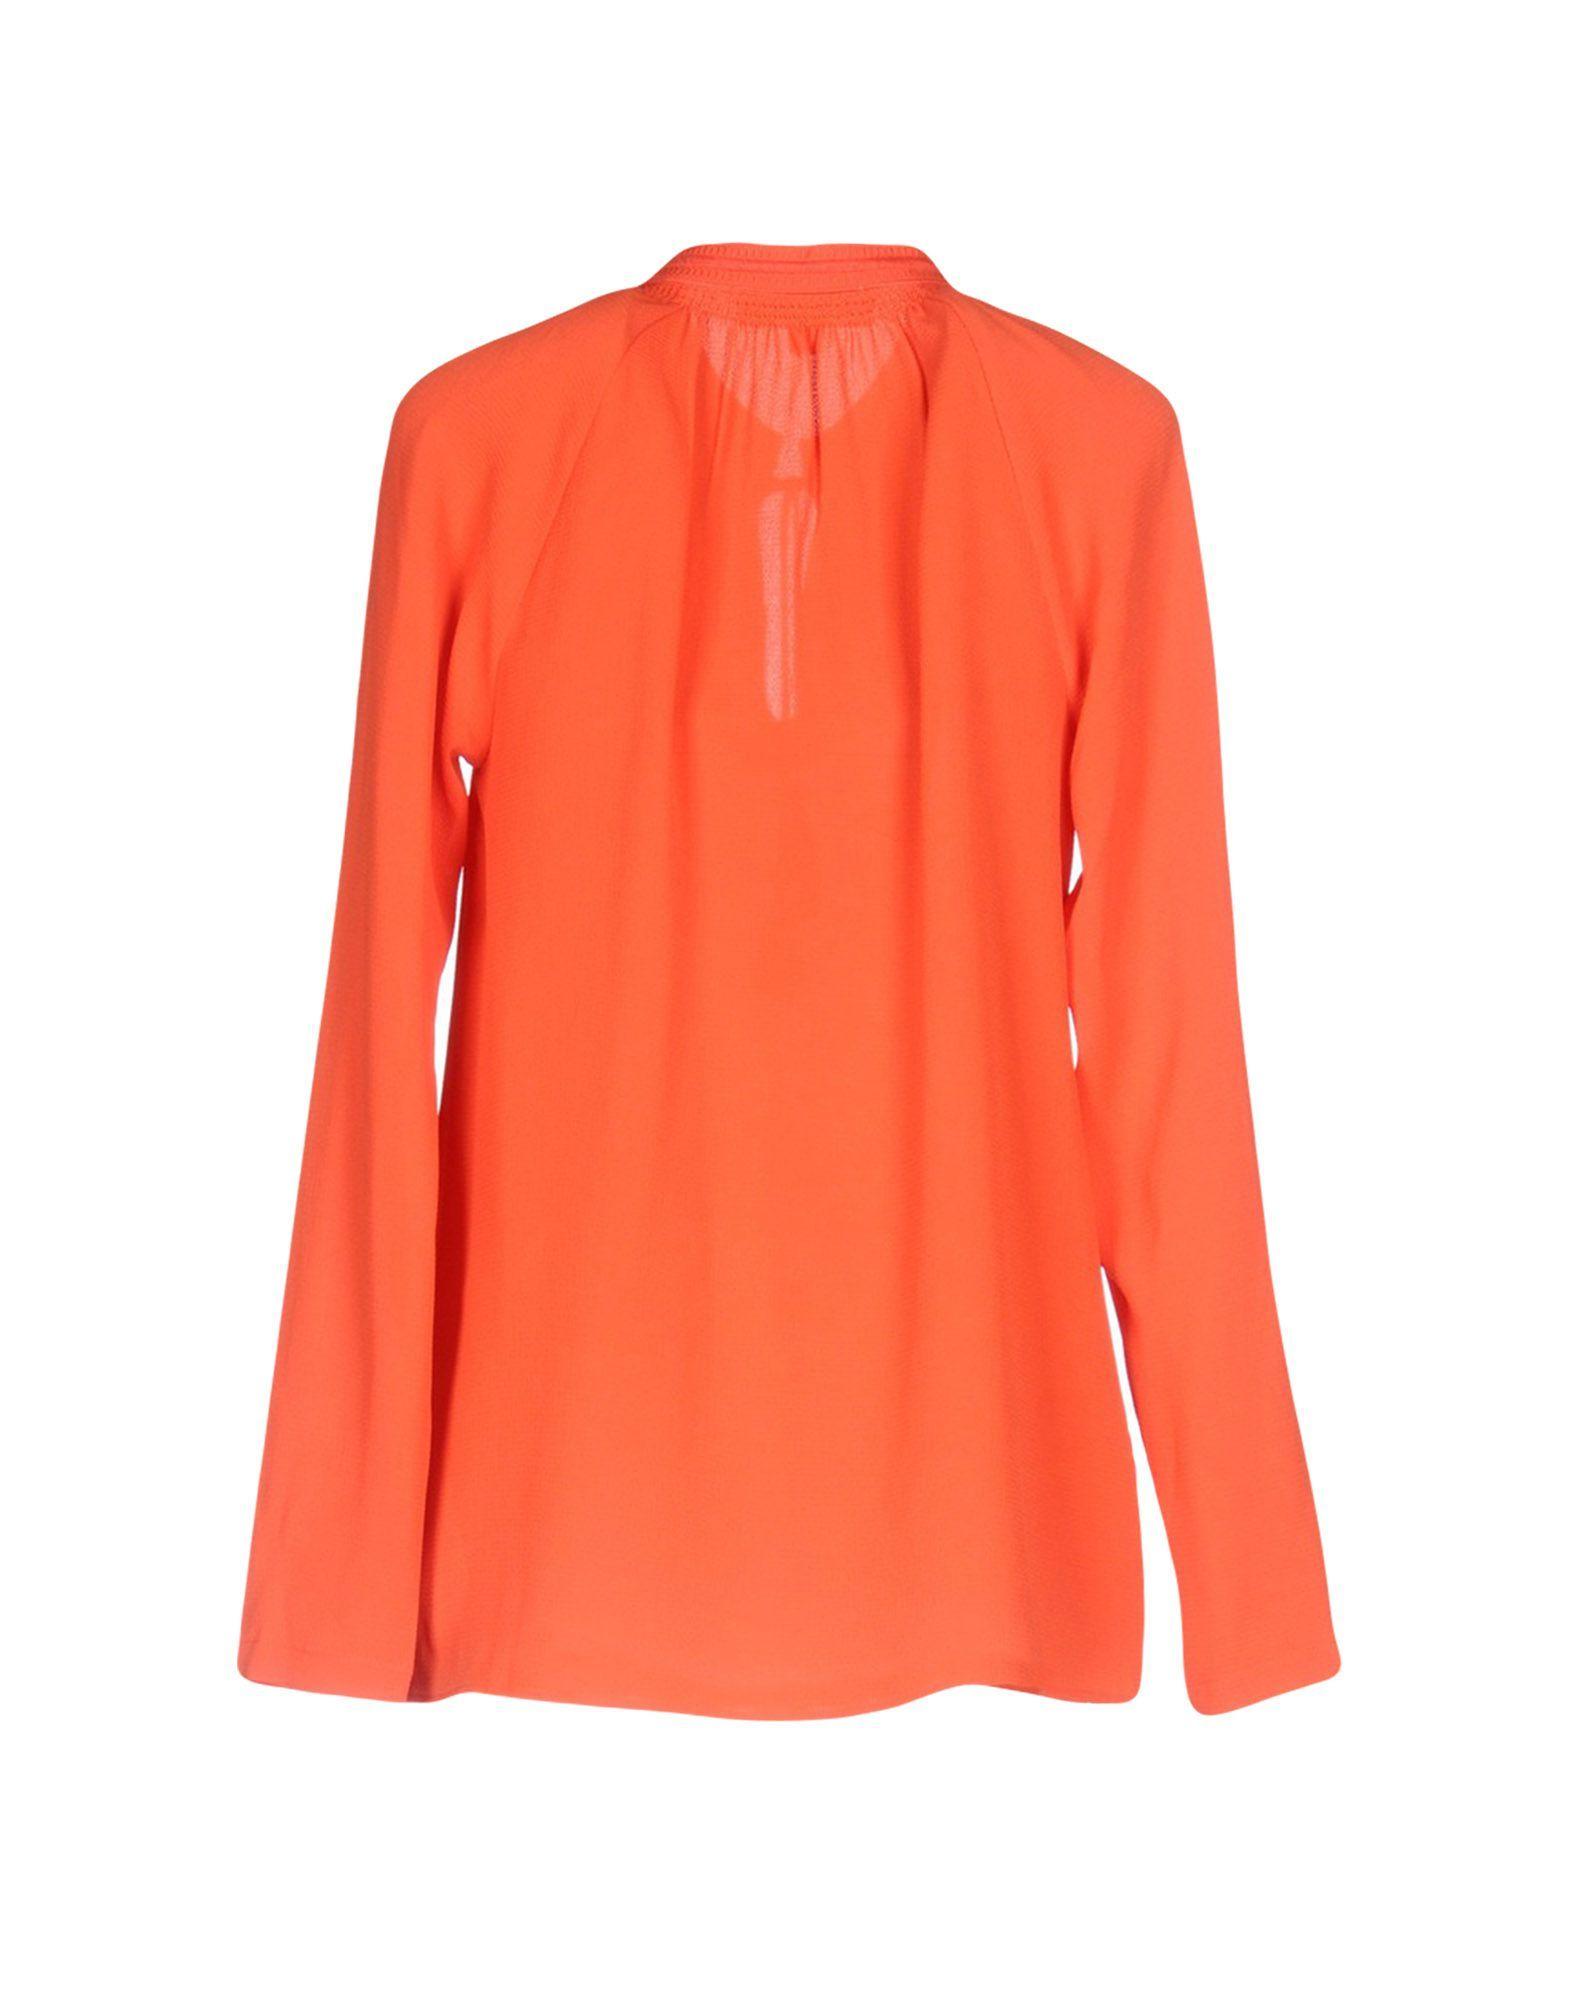 SHIRTS Michael Michael Kors Orange Woman Polyester